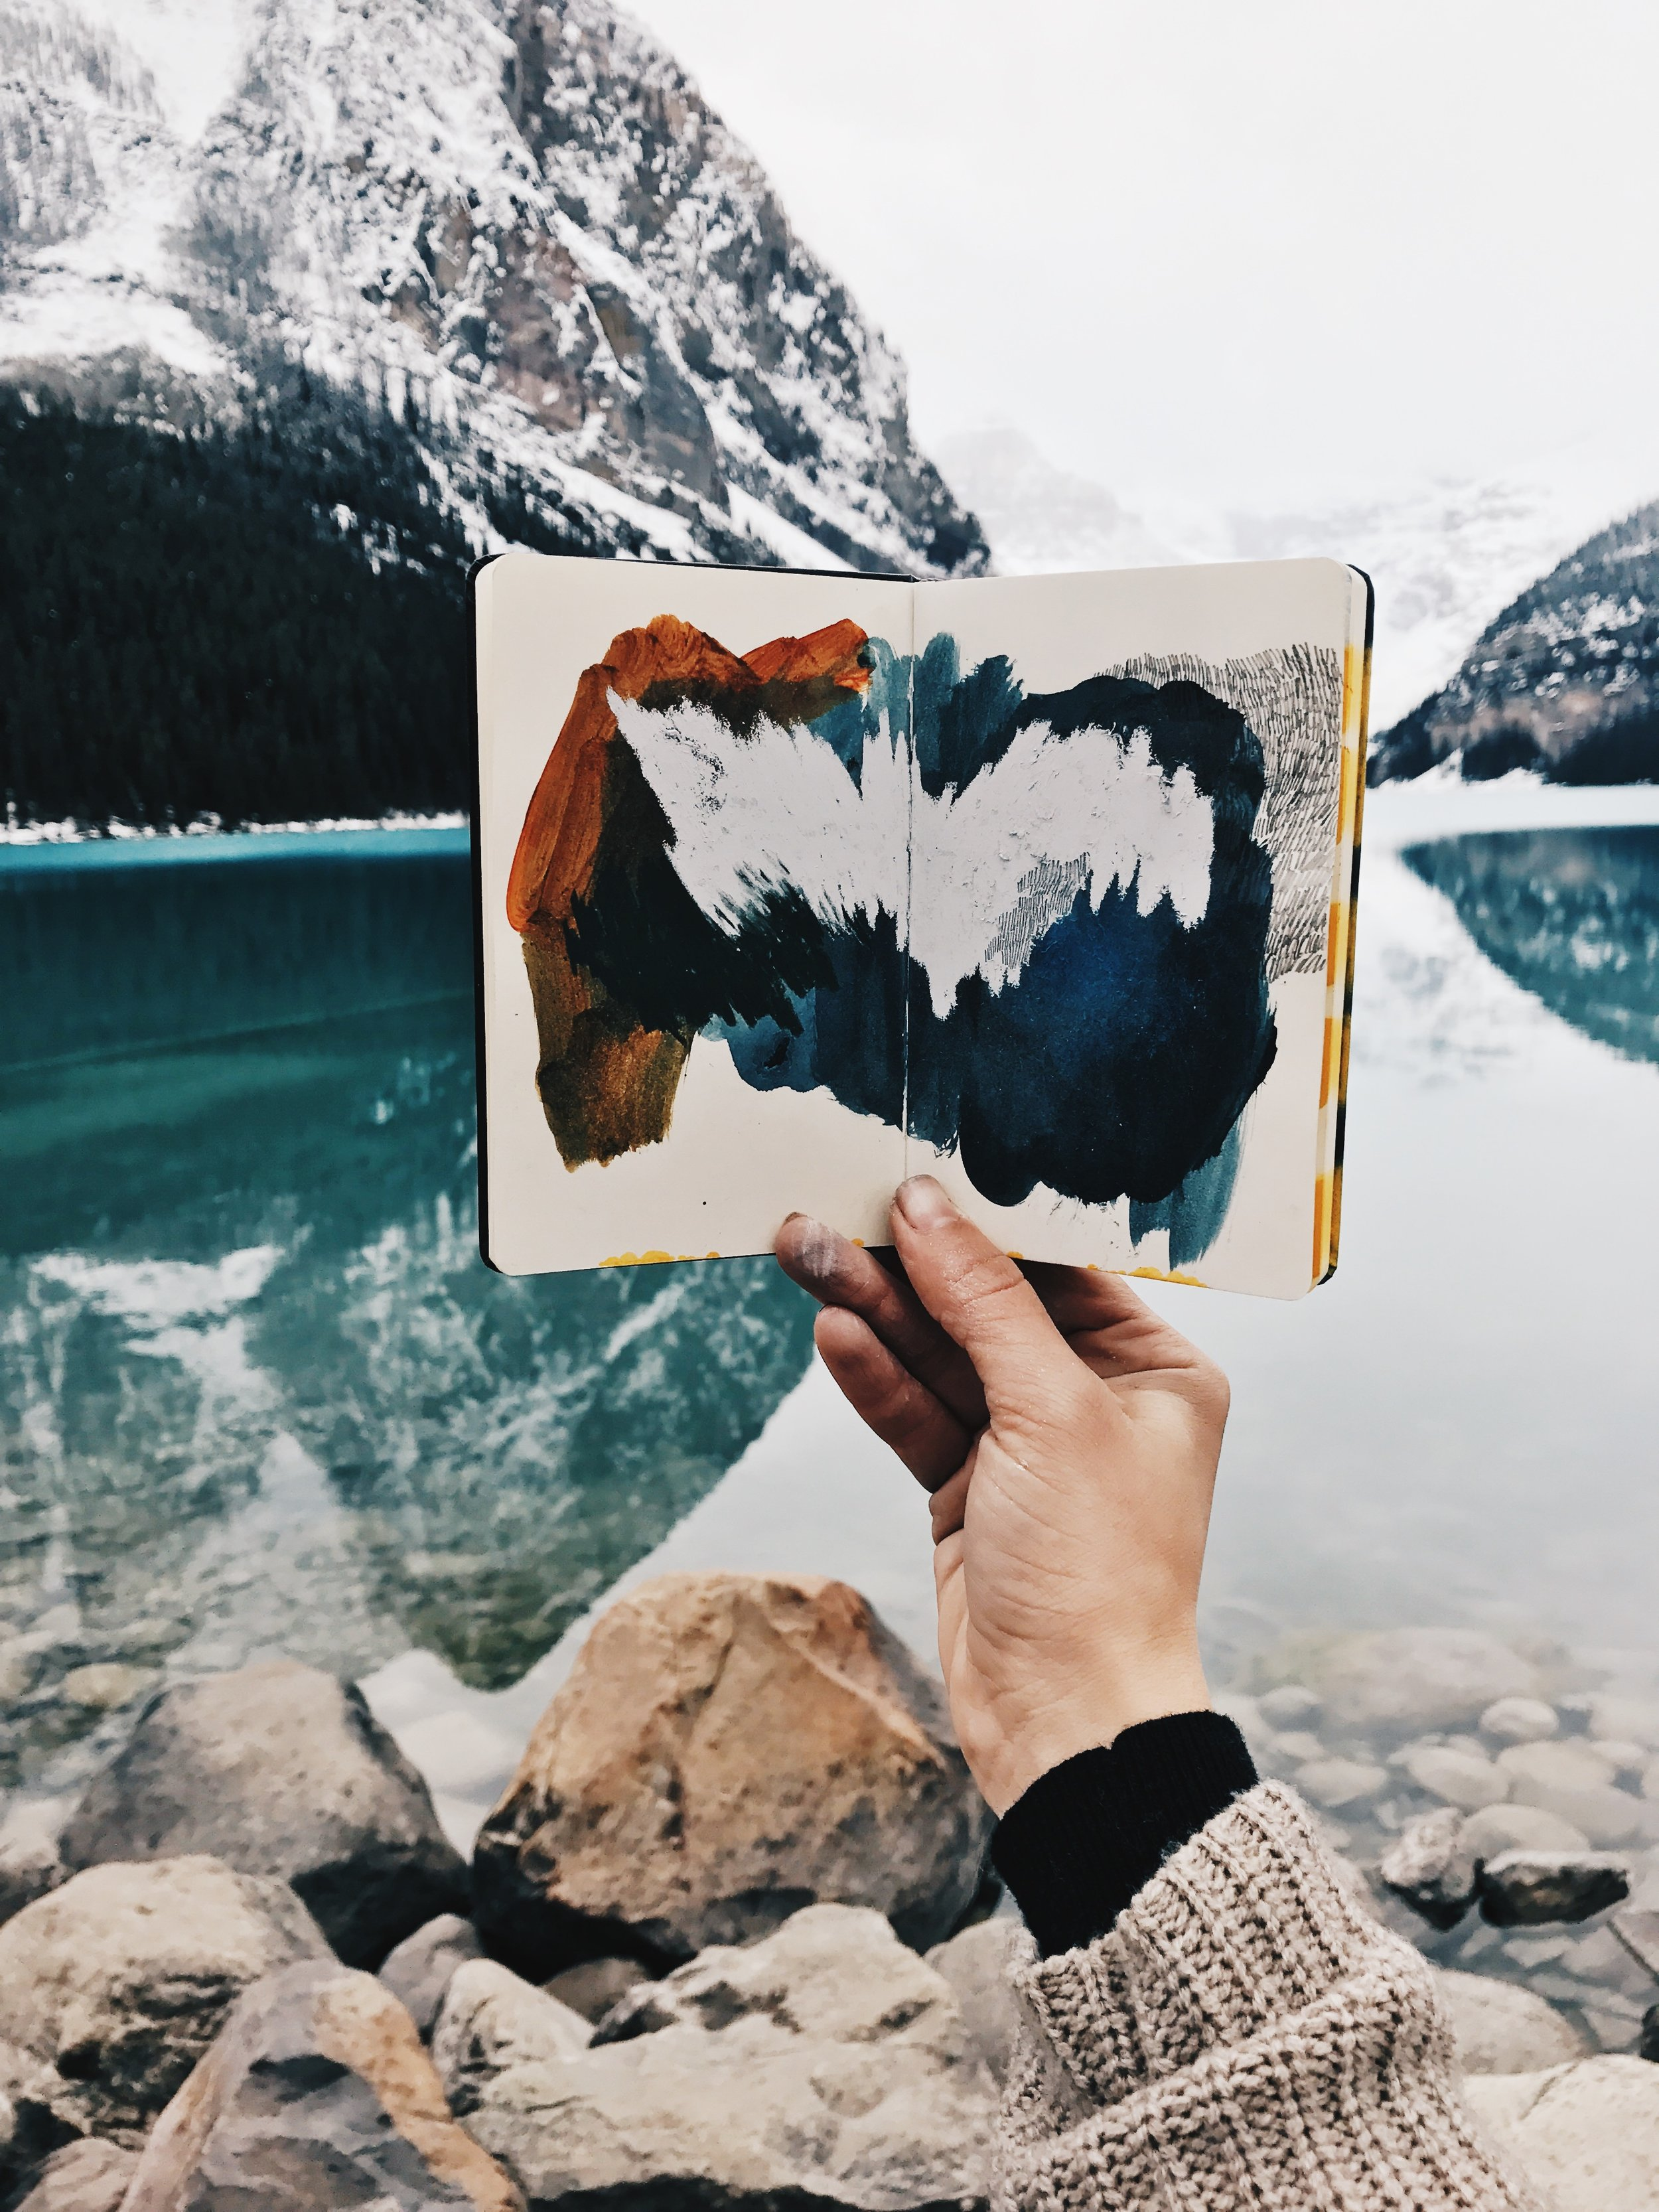 One of my sketchbooks shot at Lake Louise, Alberta, Canada.